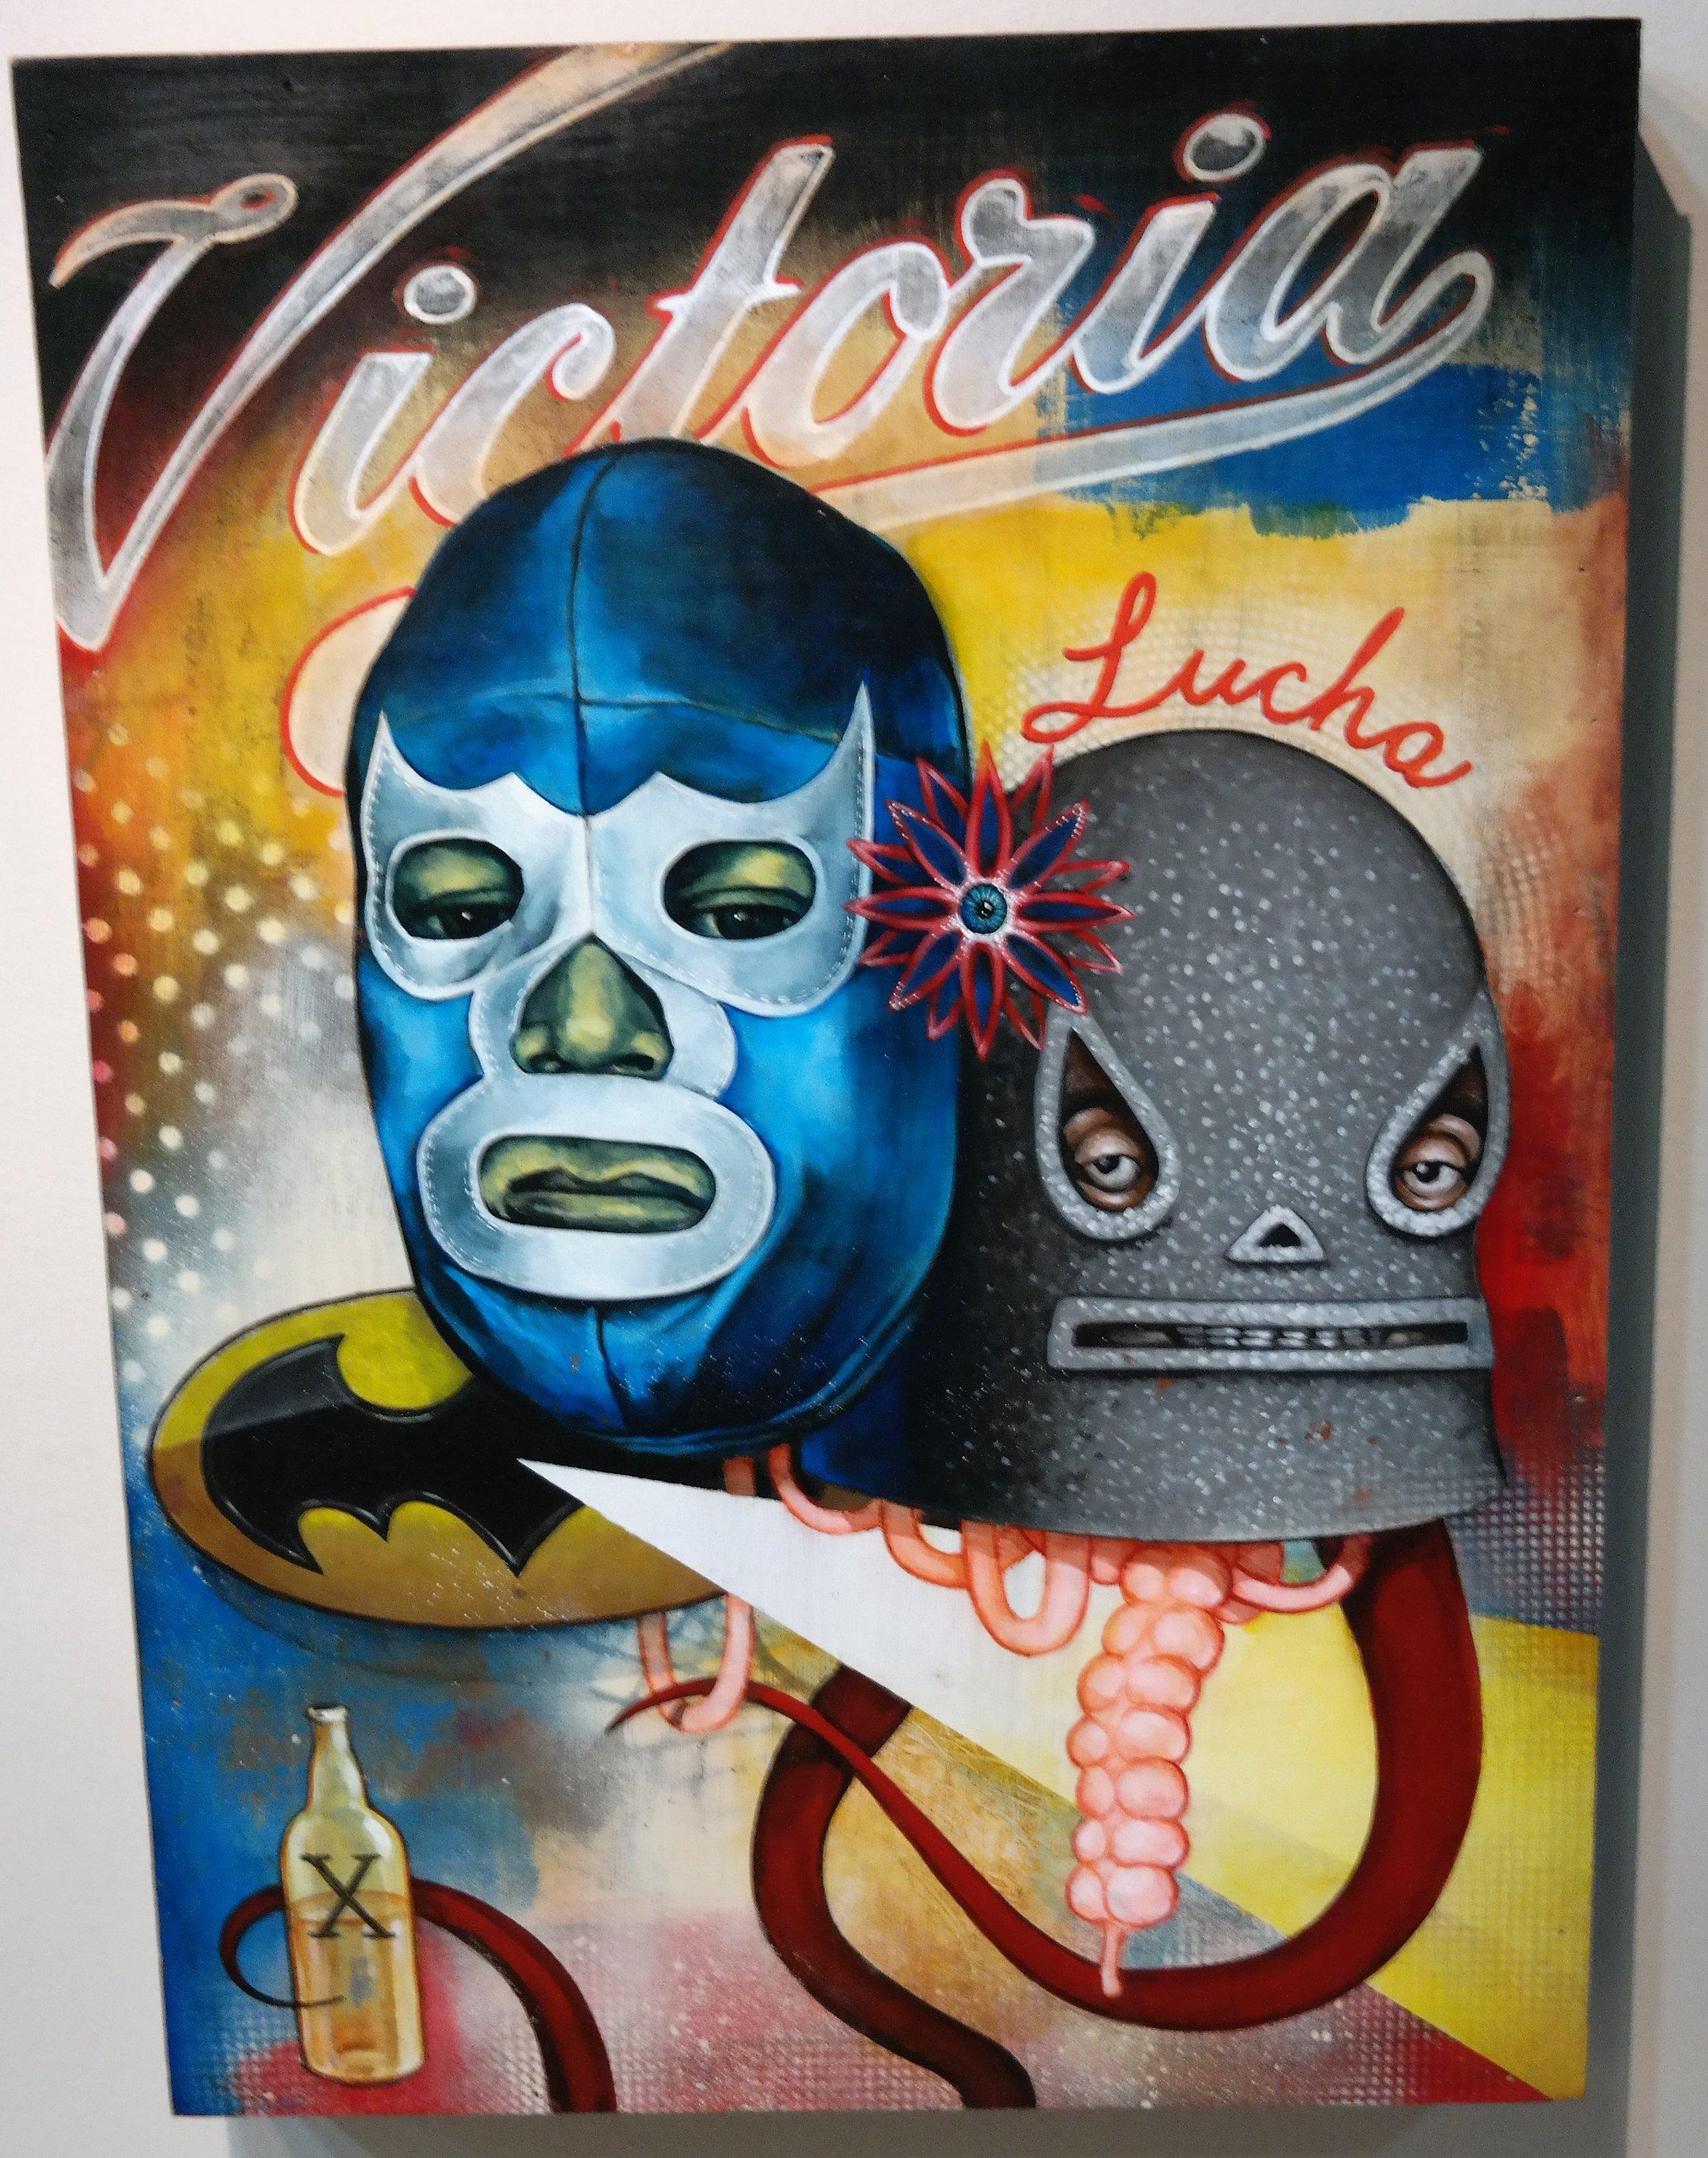 Victoria Lucha, Miguel Felipe